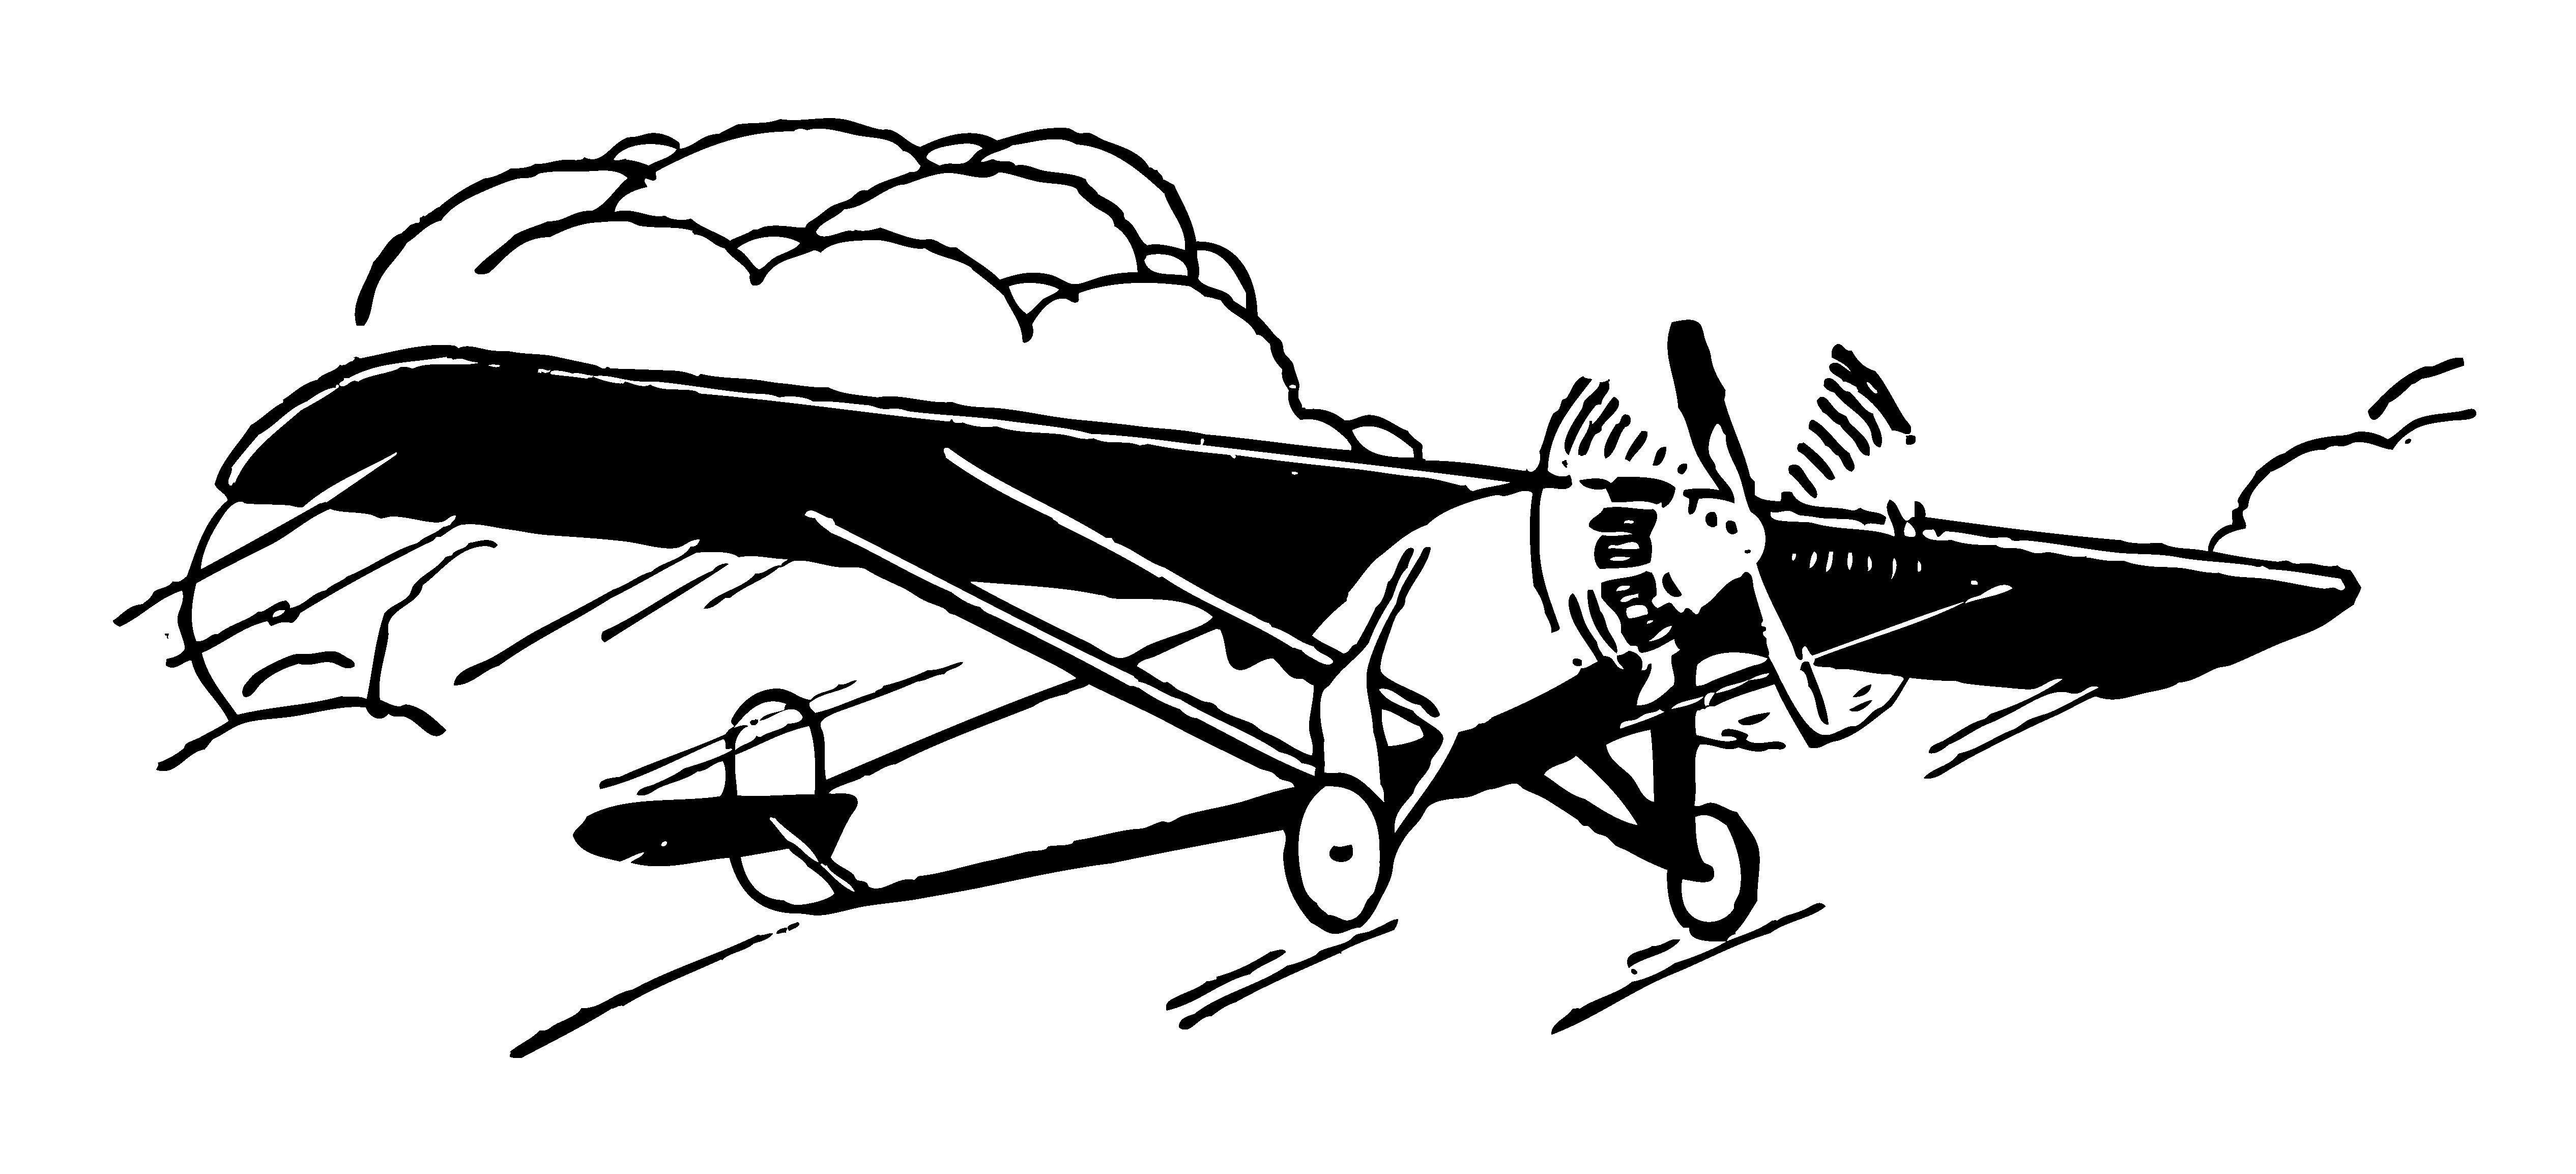 Vintage air plane clipart.